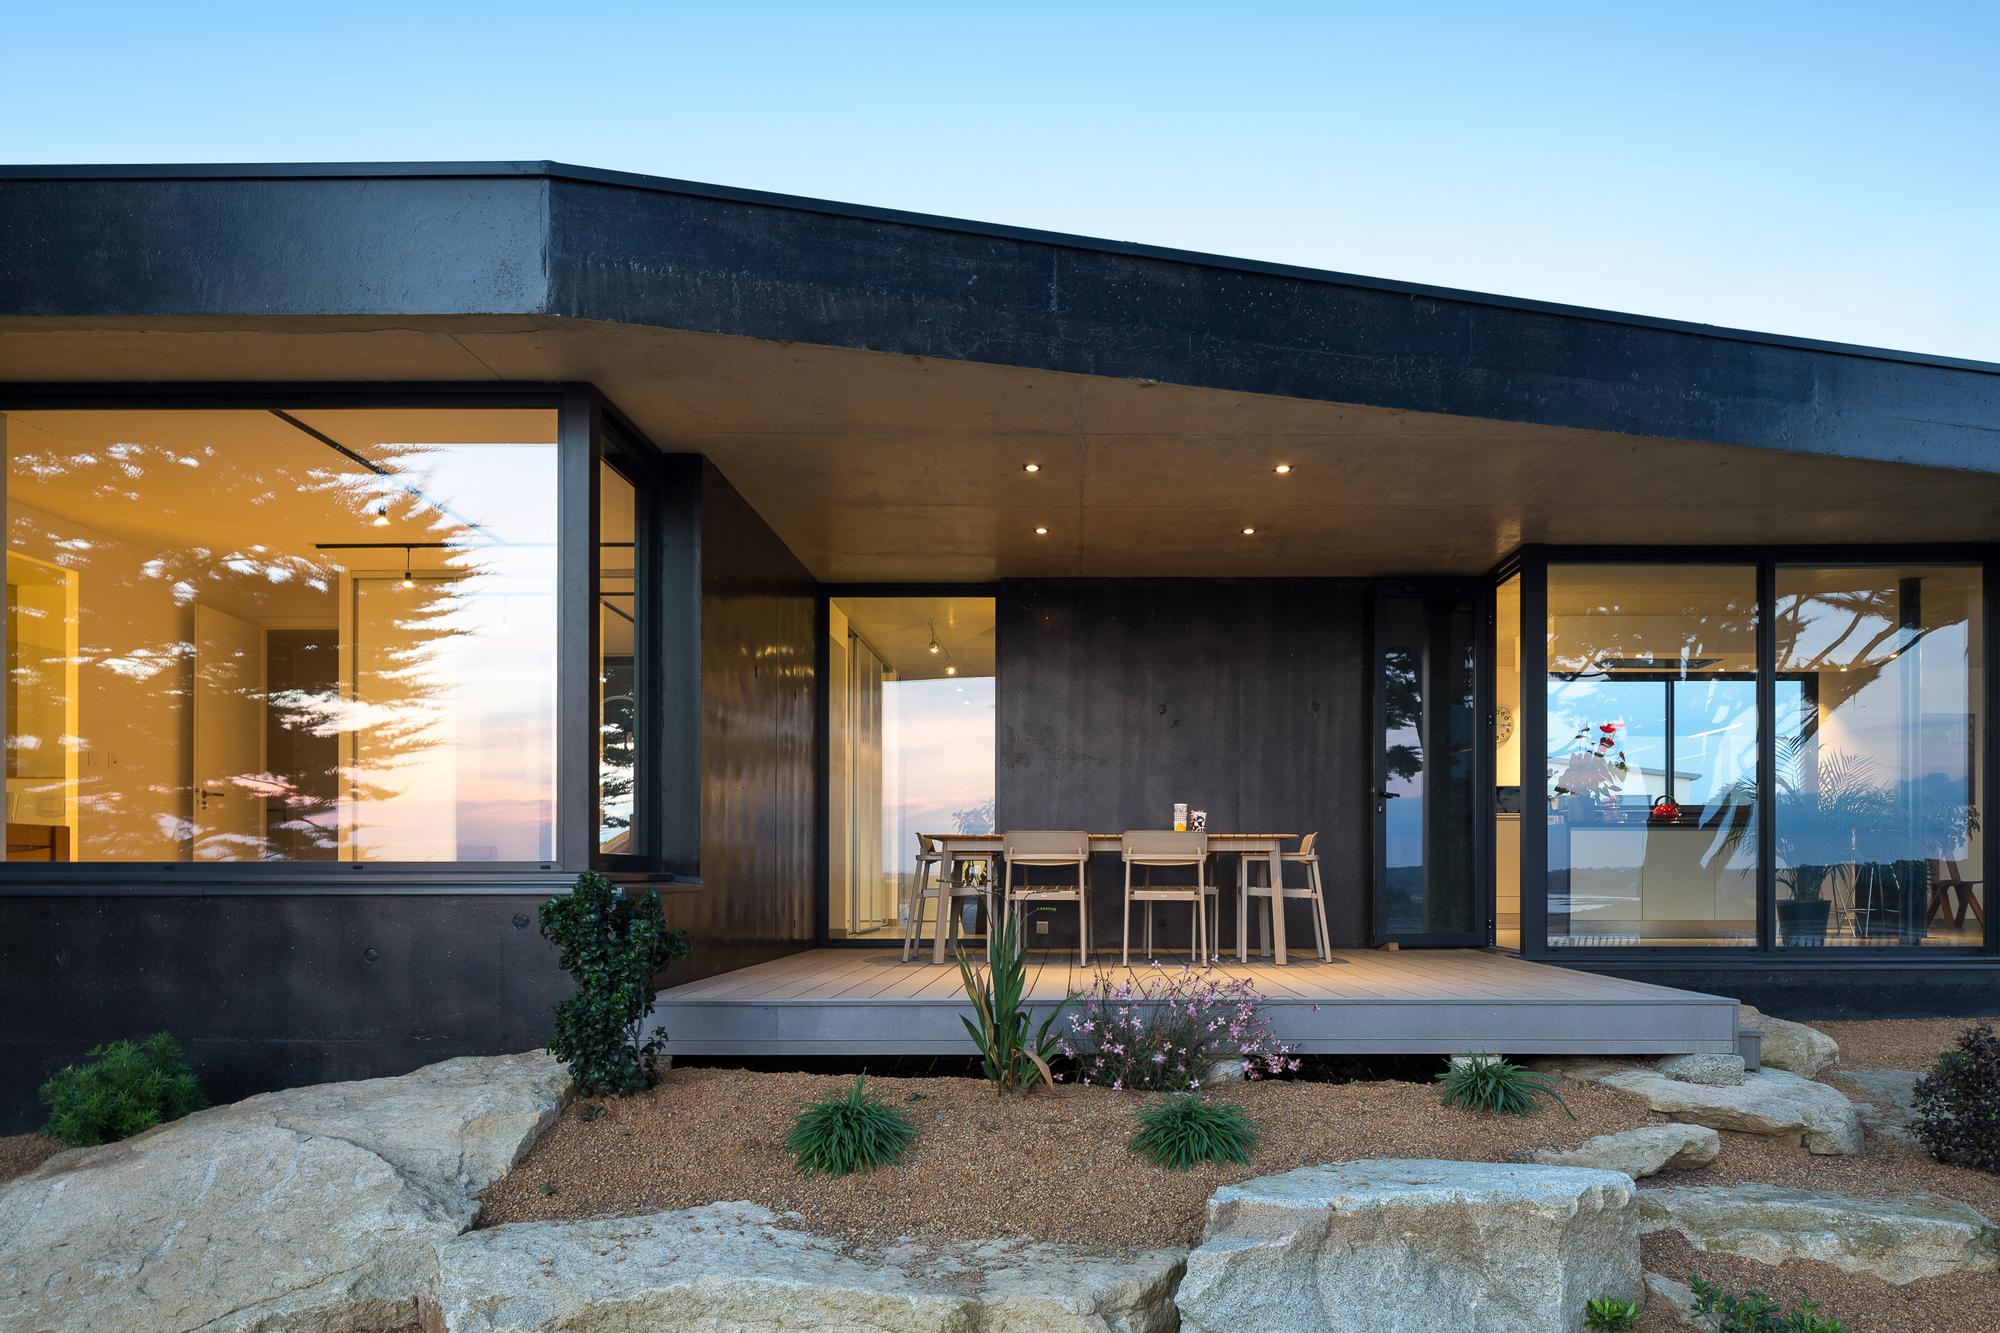 gallery of la maison noire agence anarchitecte 1. Black Bedroom Furniture Sets. Home Design Ideas